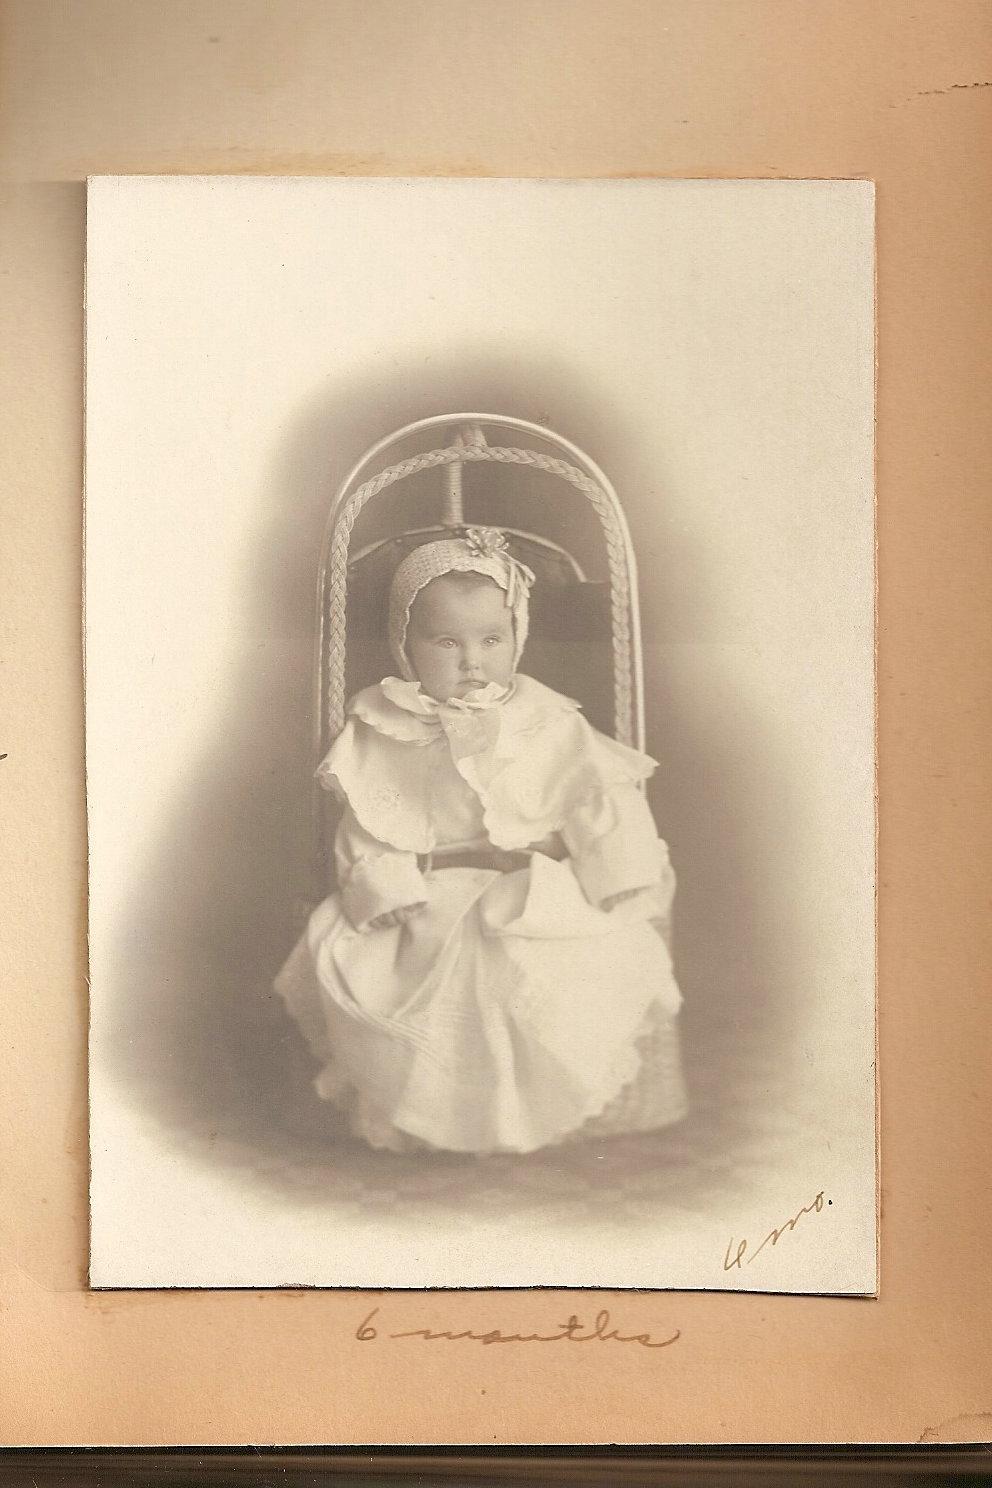 Martha Fawbush